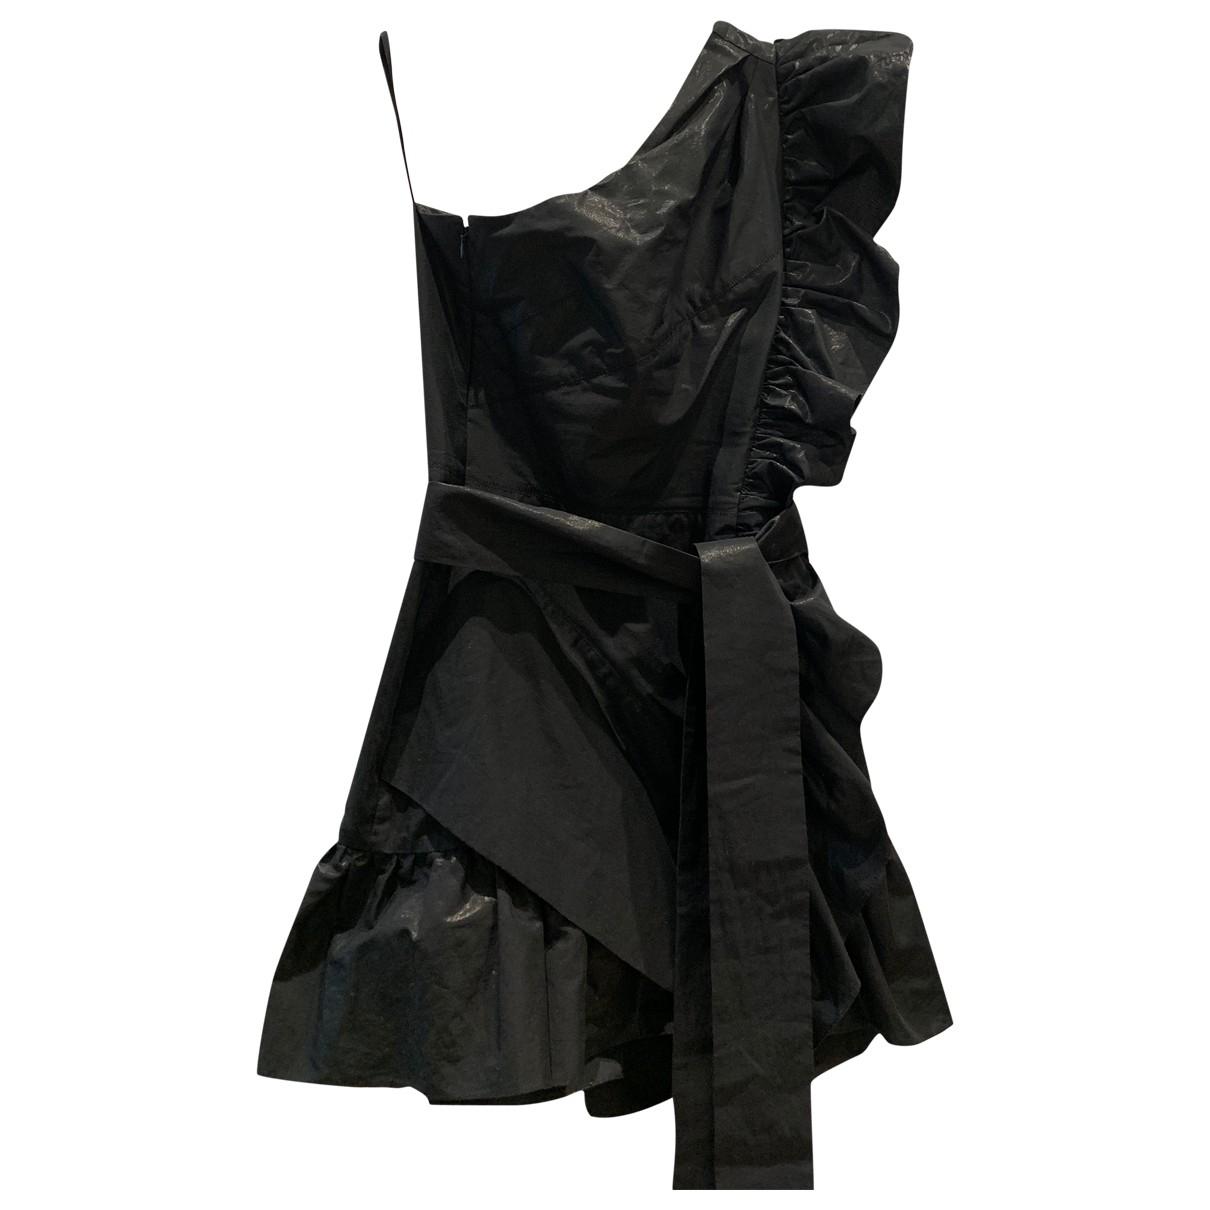 Isabel Marant \N Black Cotton dress for Women 36 FR